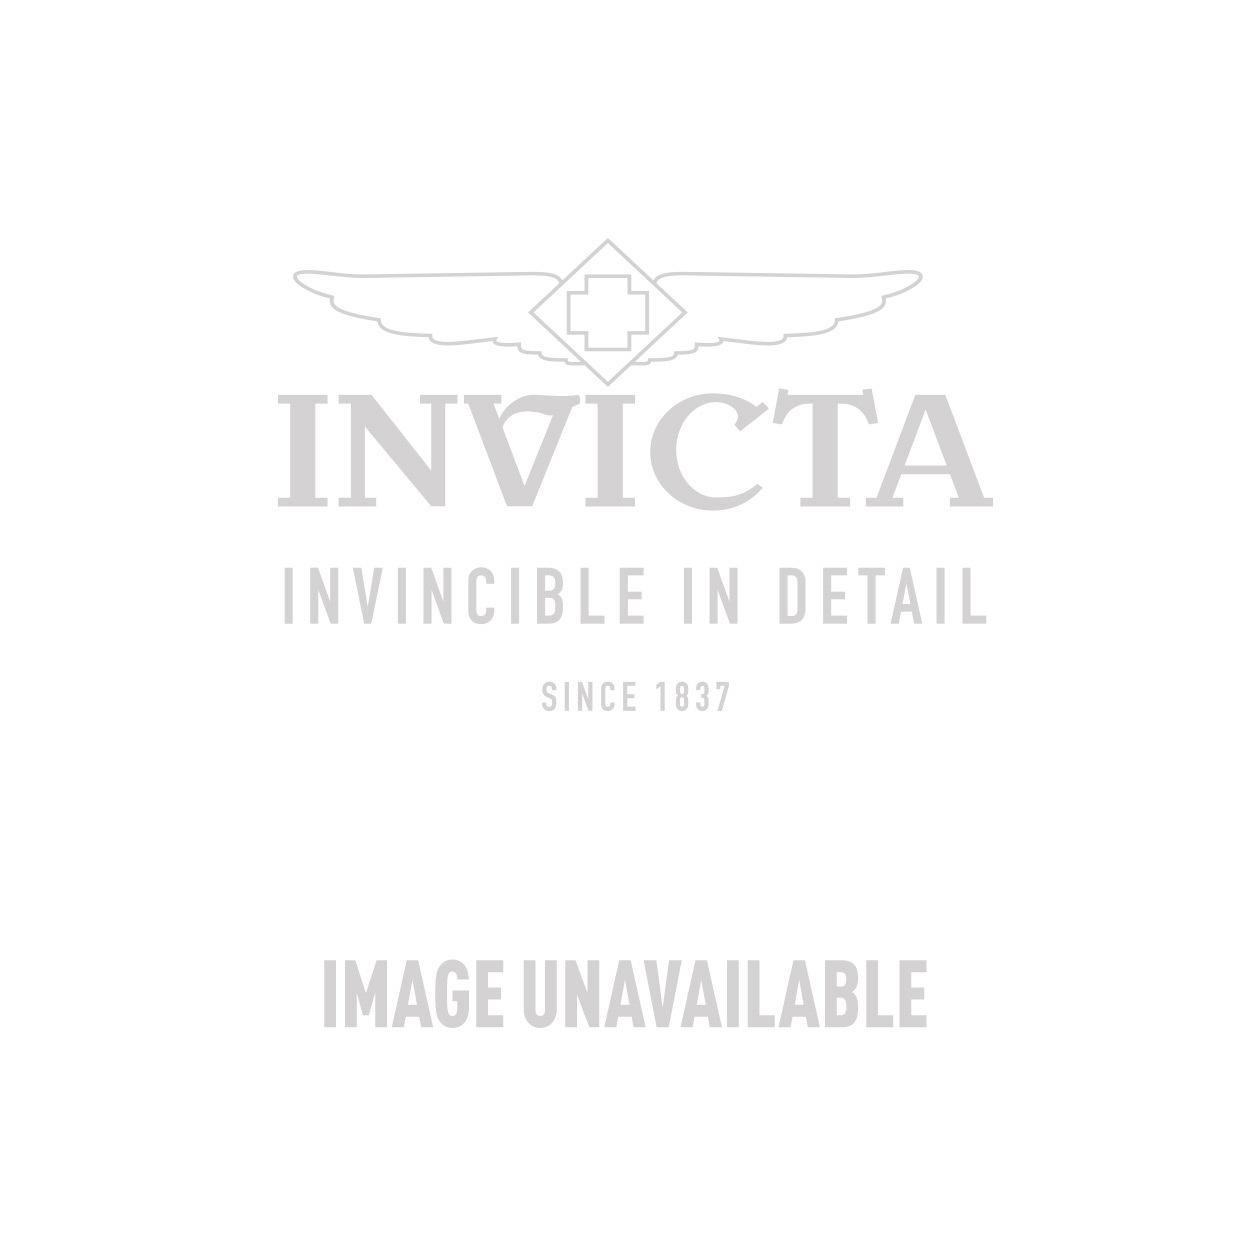 Invicta Reserve Swiss Made Quartz Watch - Black, Gunmetal case with Black, Gunmetal tone Stainless Steel, Polyurethane band - Model 6315